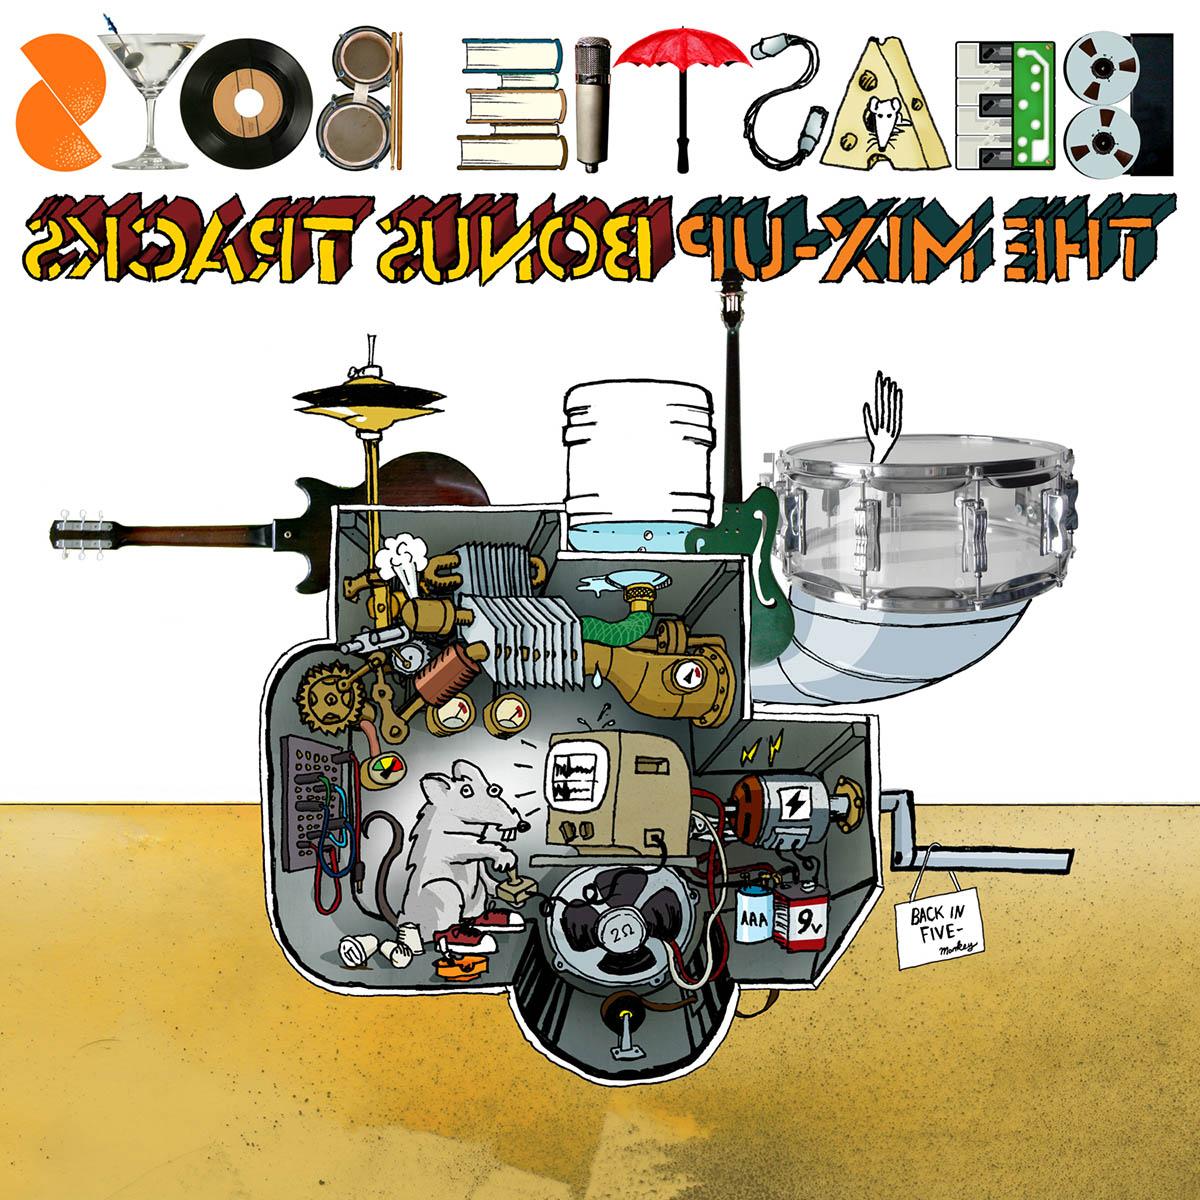 Beastie Boys, The Mix-Up